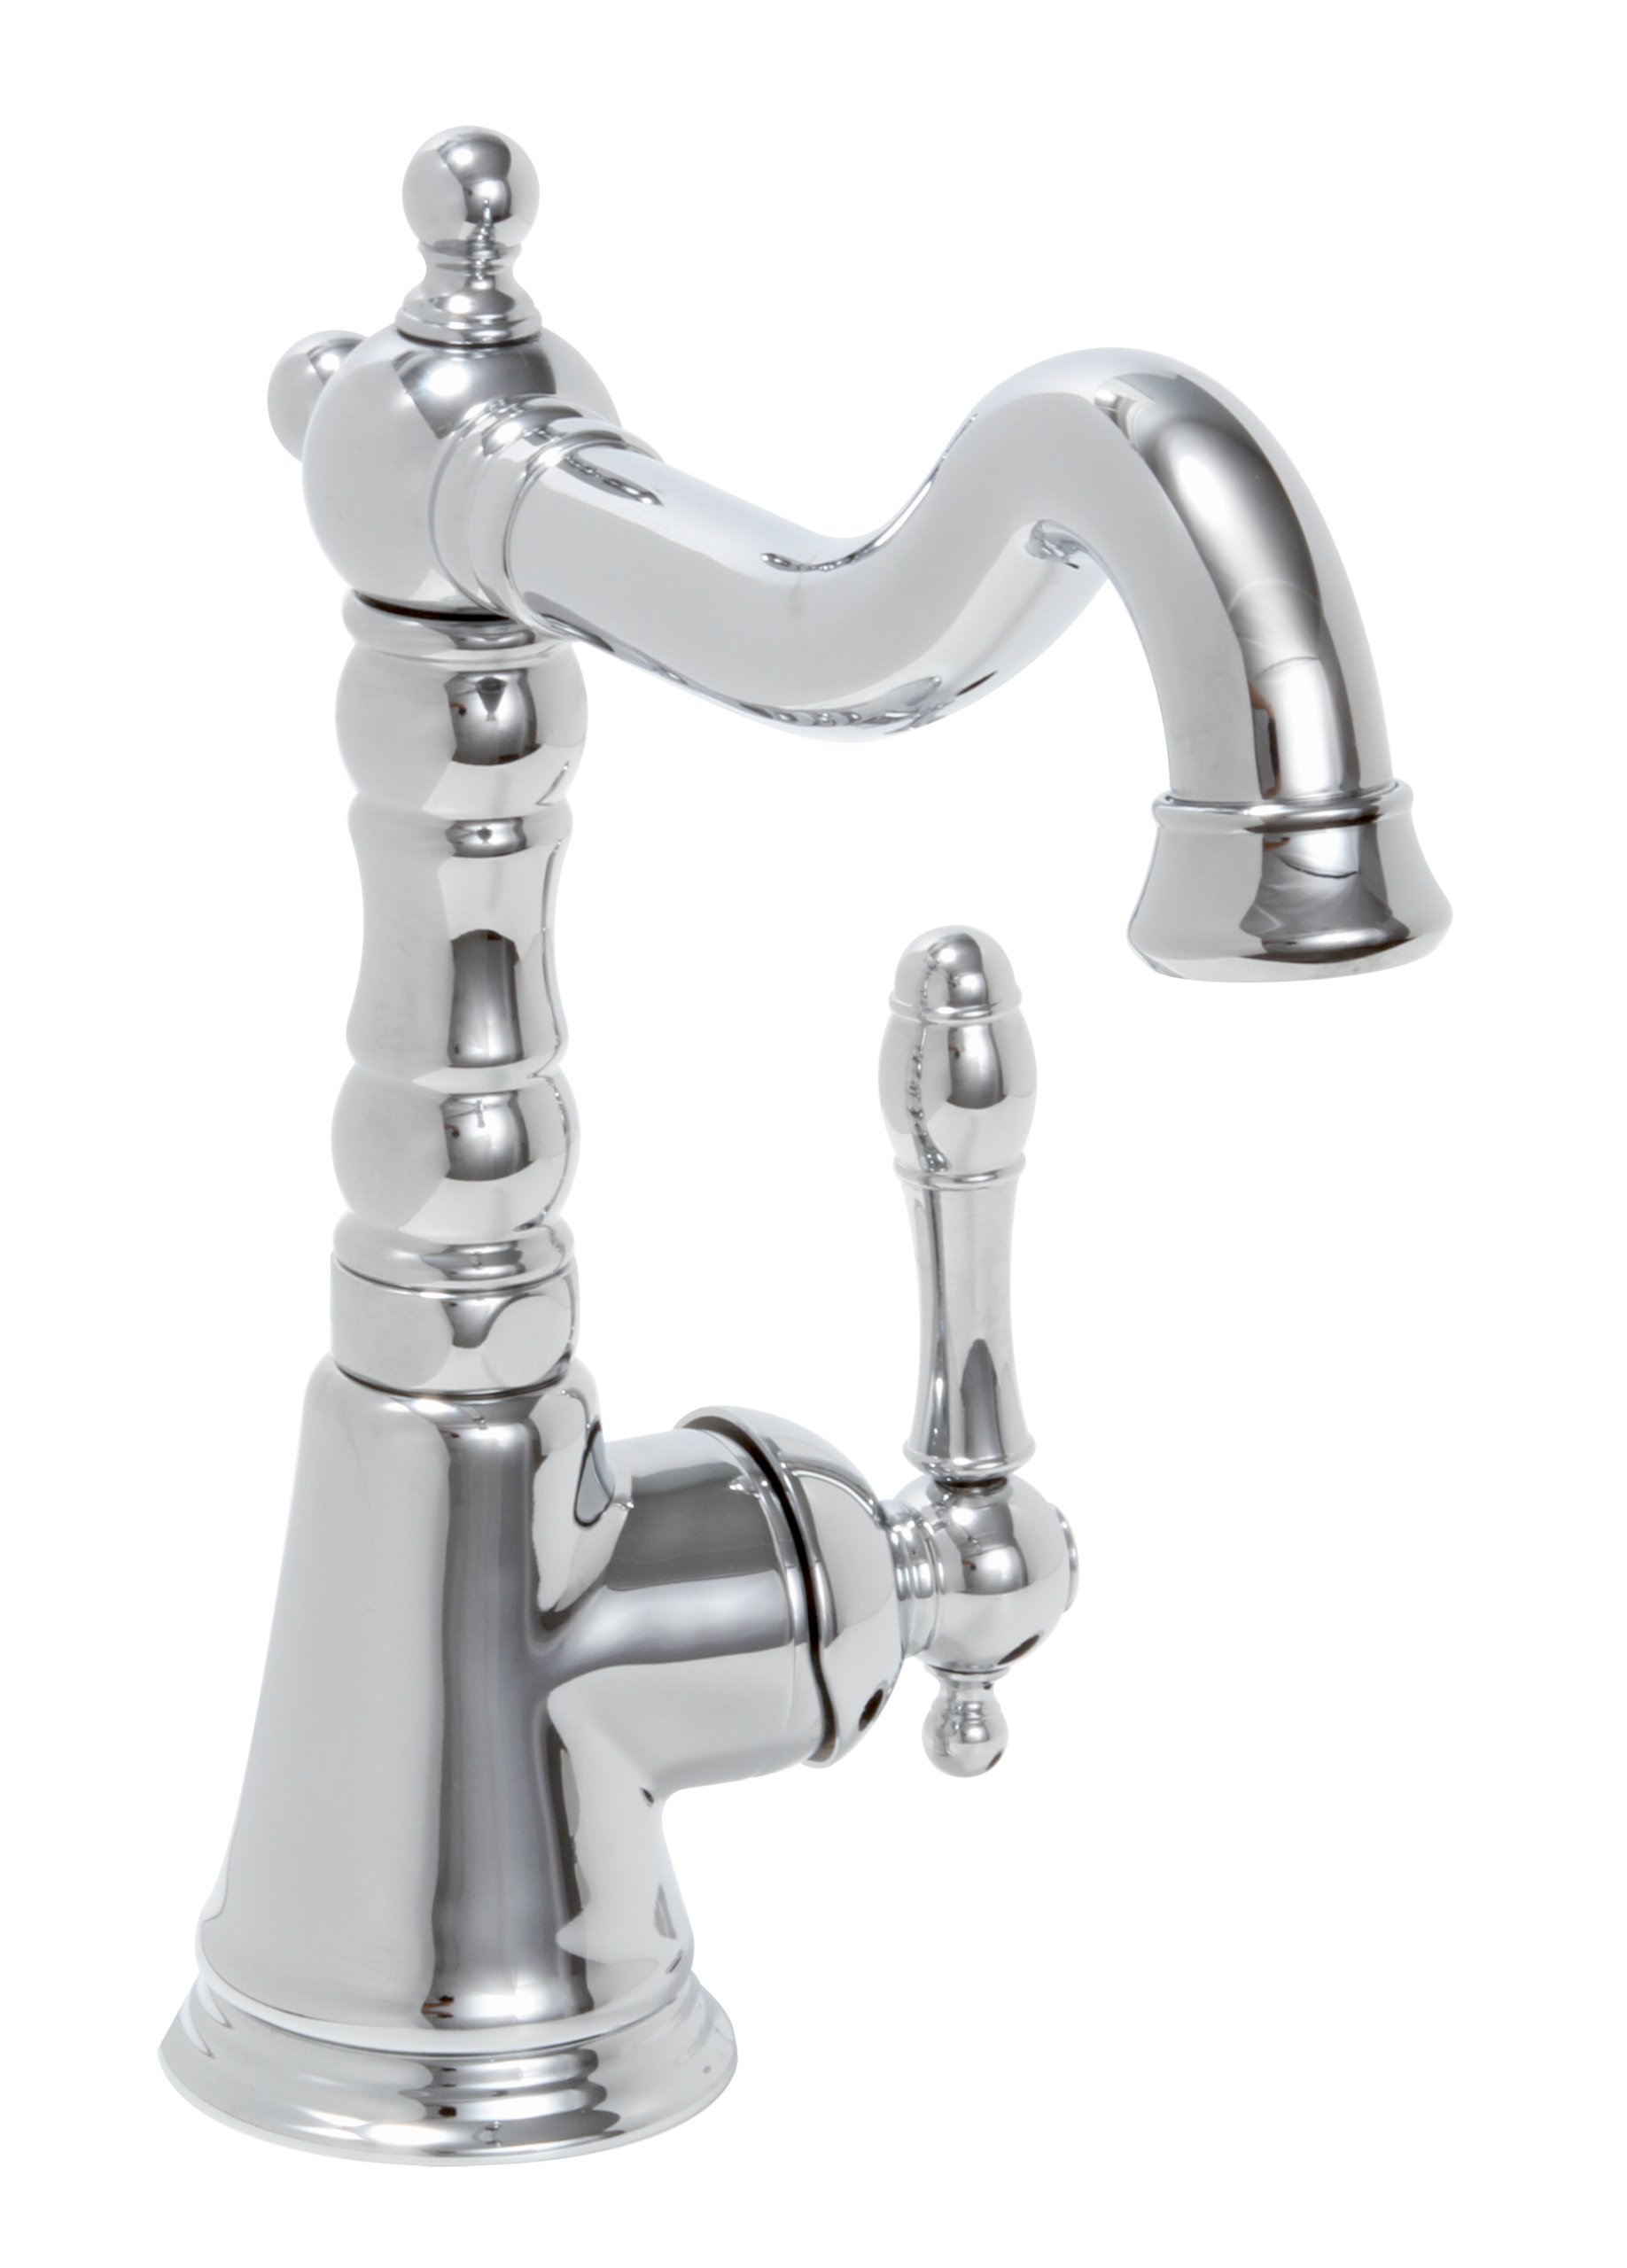 Premier 120347LF Charlestown Lead-Free Single-Handle Bar Faucet, Chrome by Premier